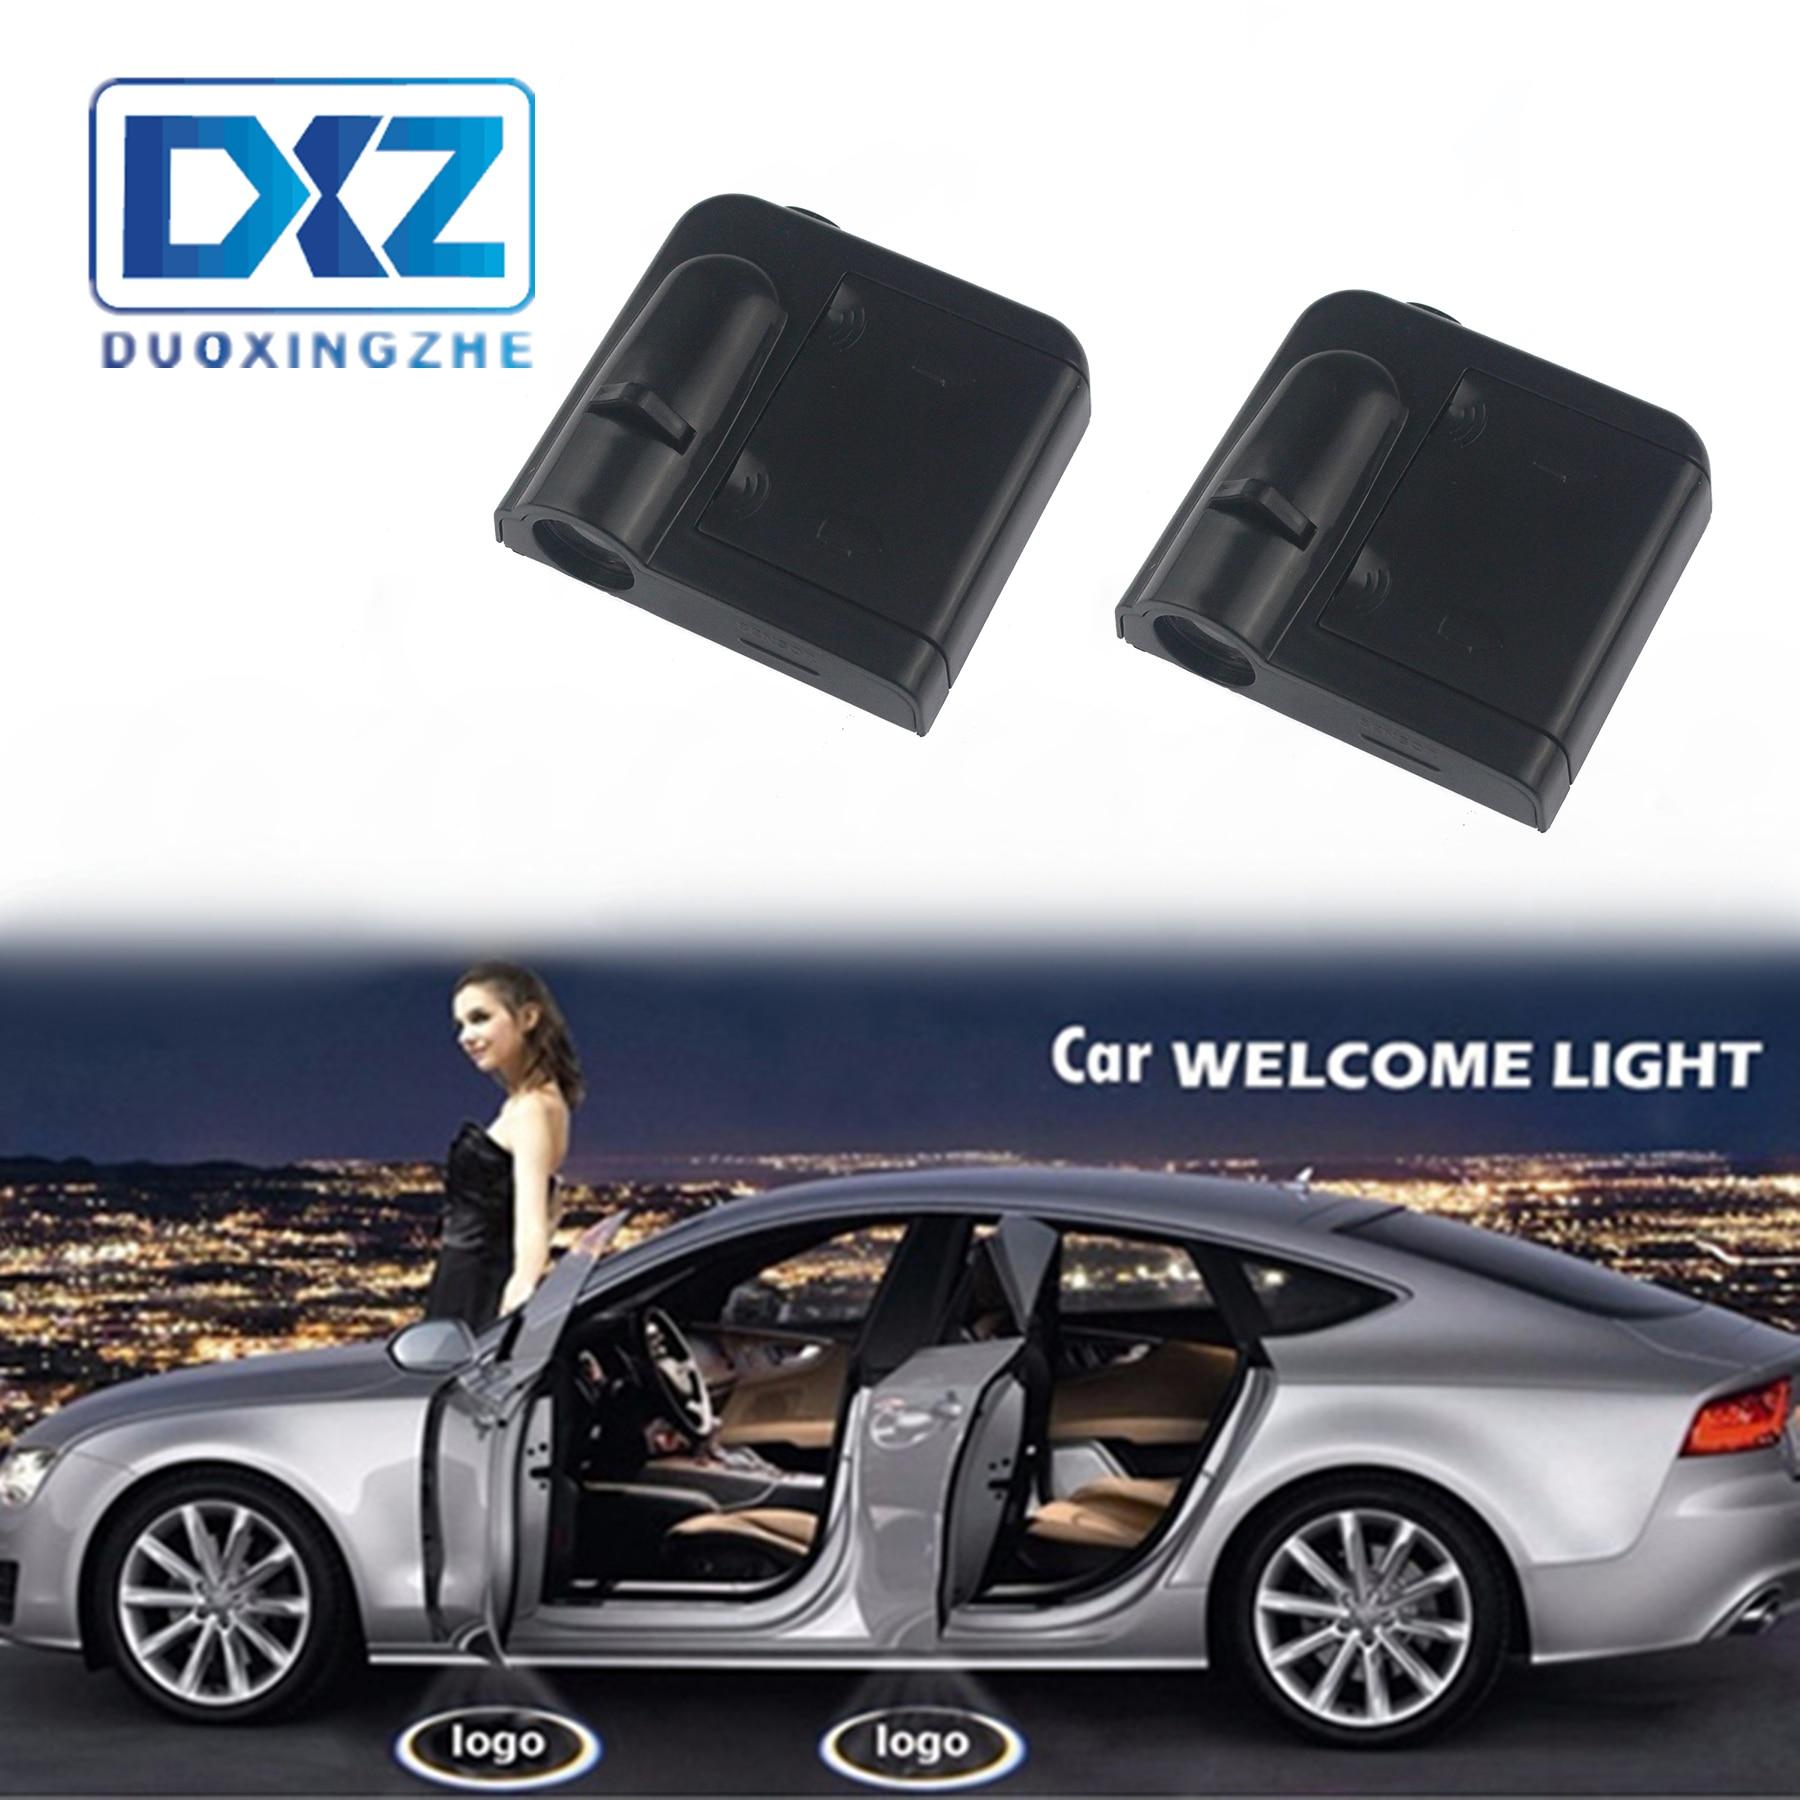 DXZ 2X Wireless Car LED Door Logo Light Laser Projector Ghost Shadow Welcome Light Universal For Opel Alfa remeo VW Mazda Volvo Pakistan